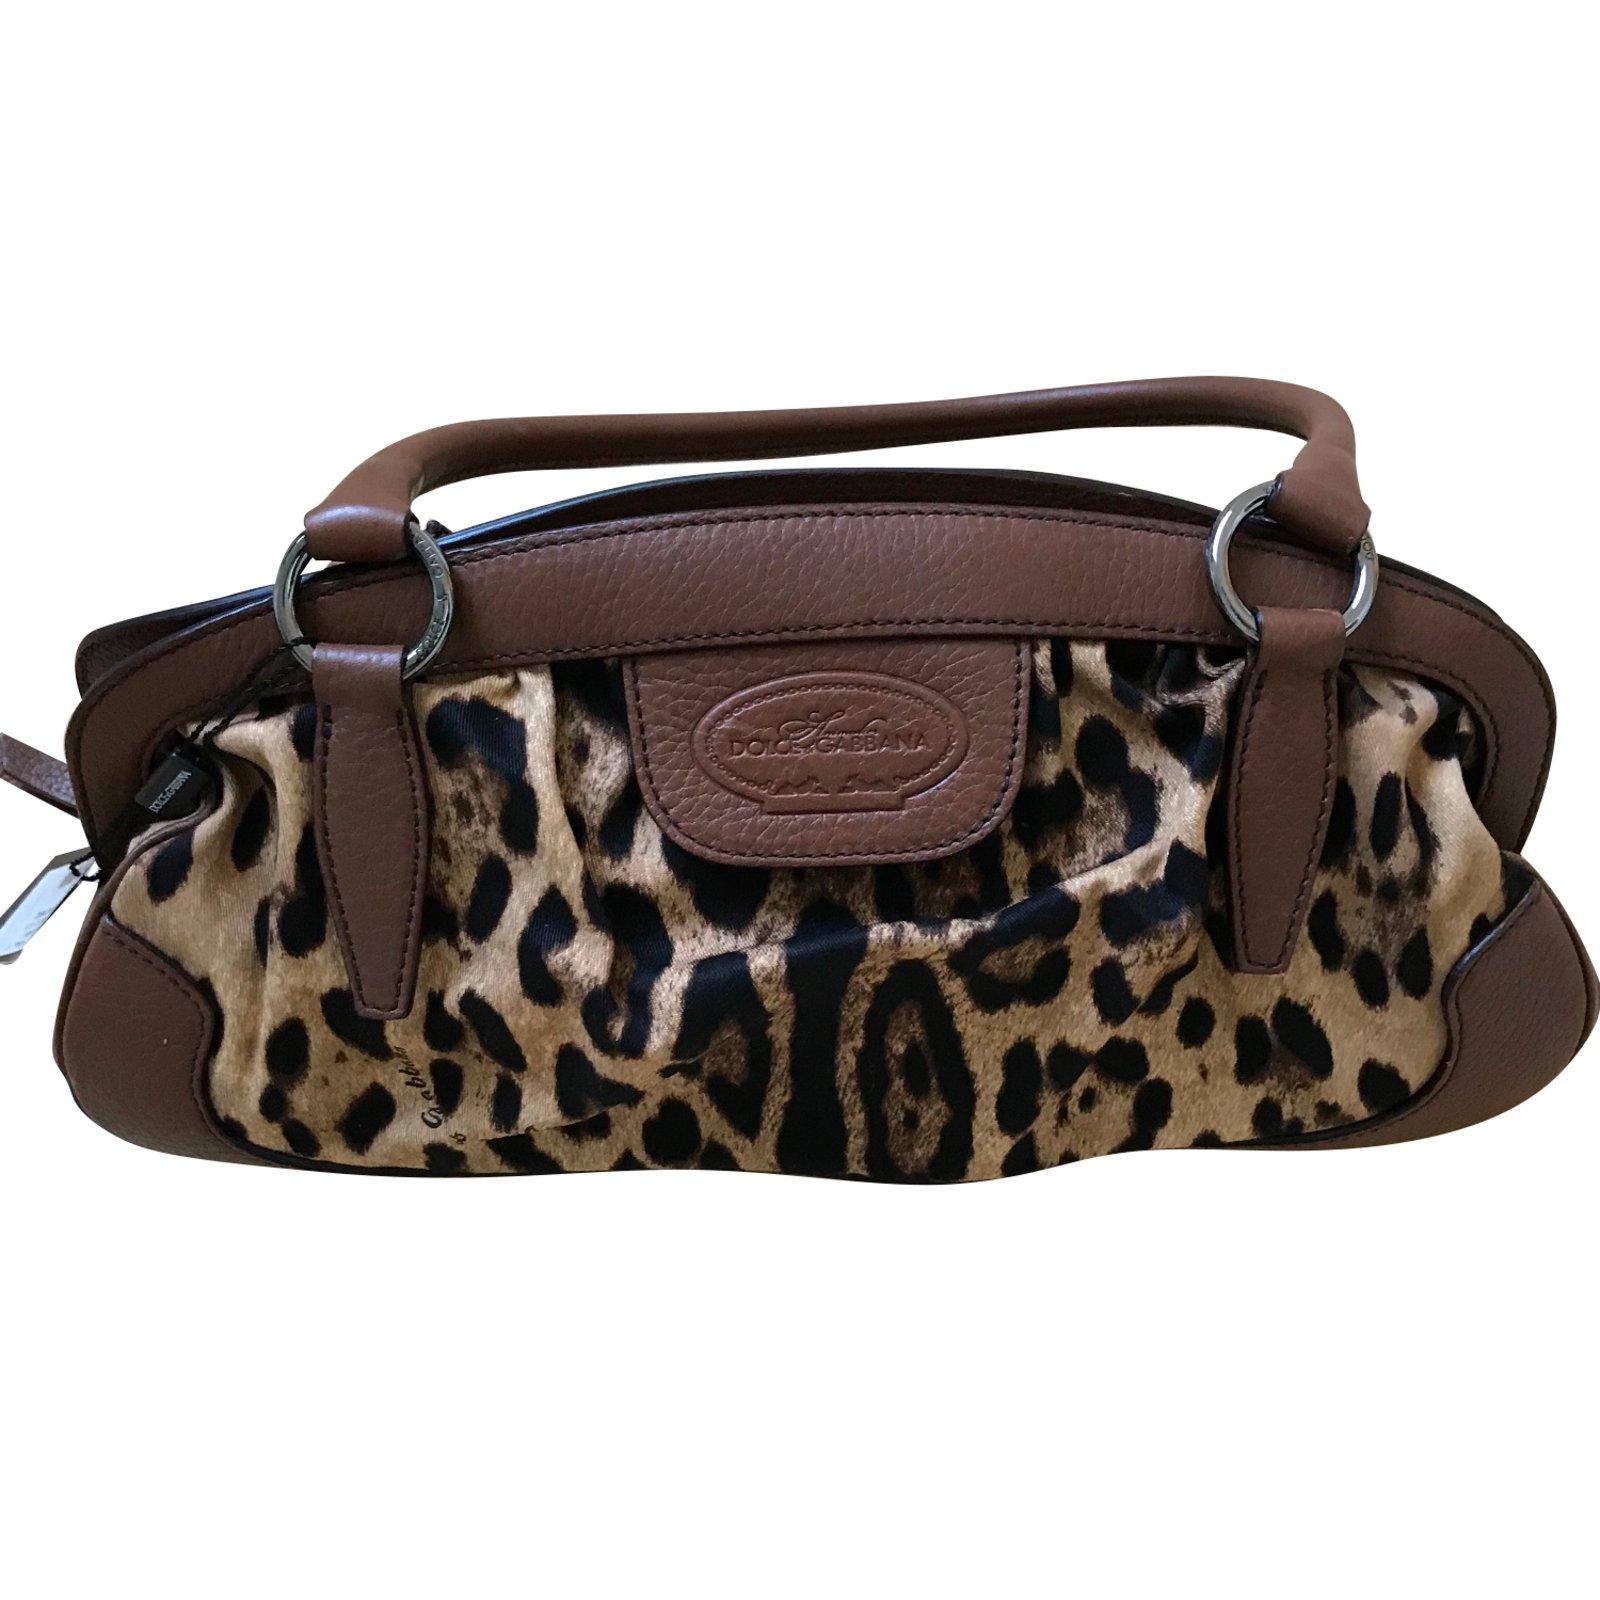 b631f4a0d0 Dolce   Gabbana Handbags Handbags Other Leopard print ref.50018 ...